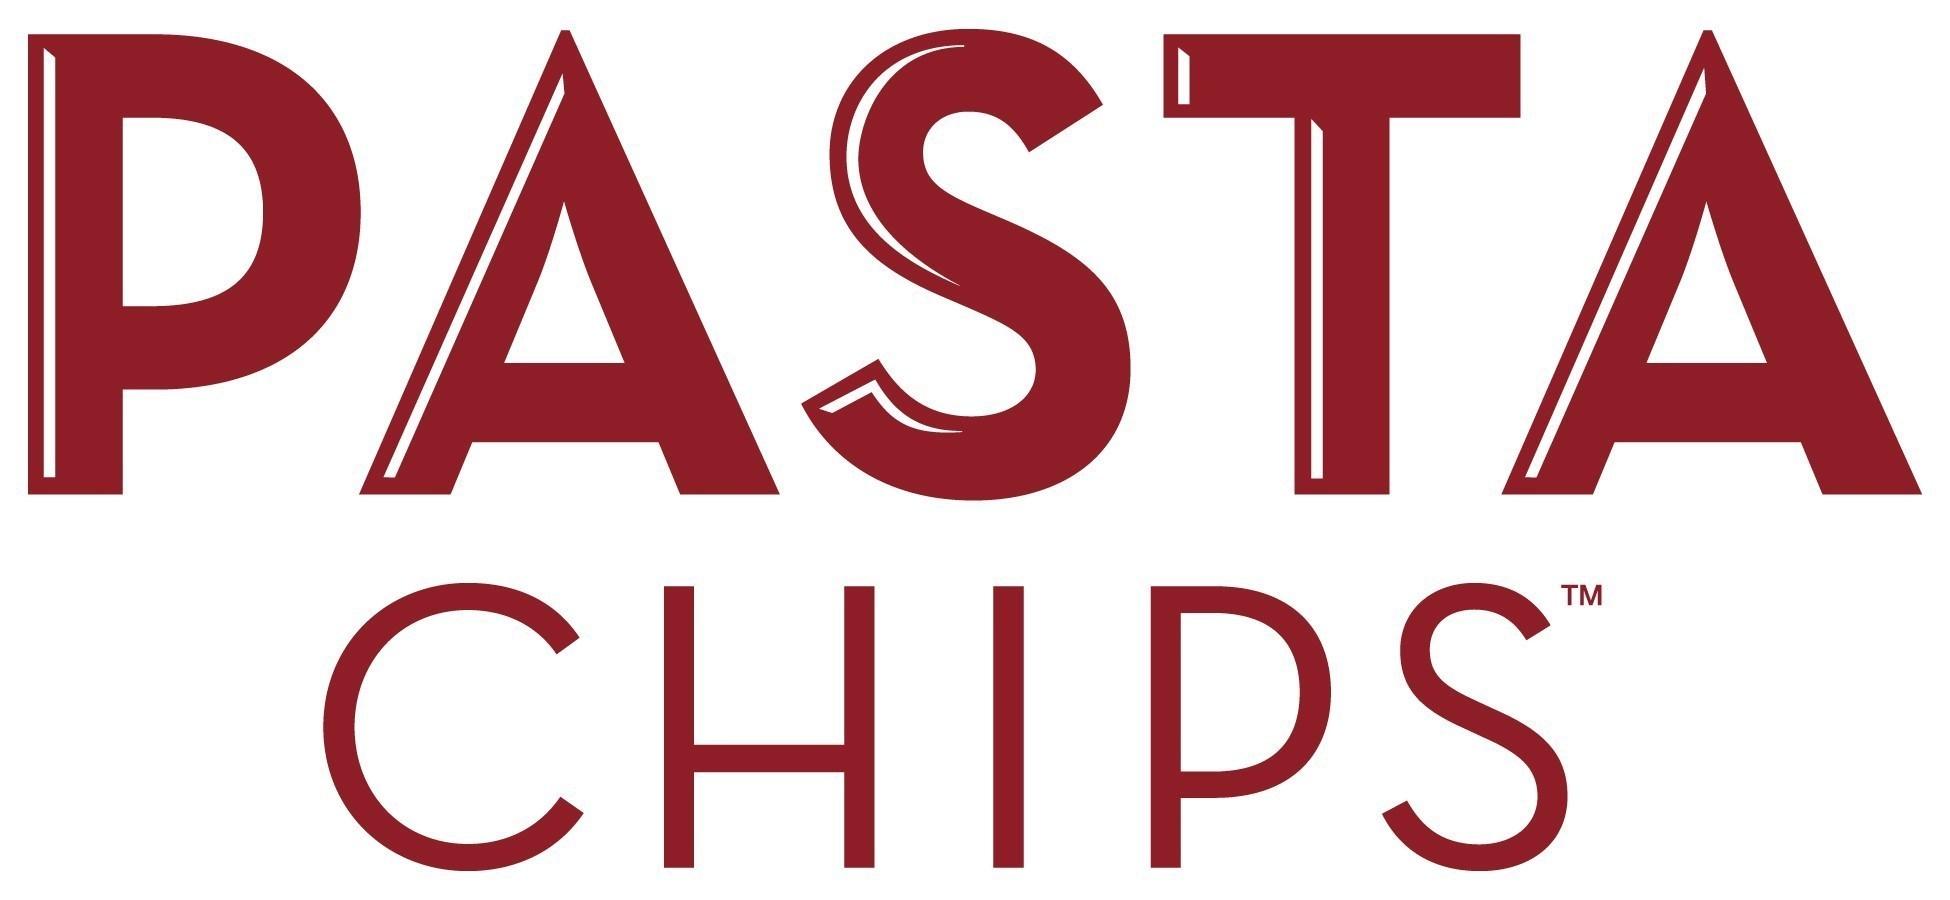 Pasta Chips Logo